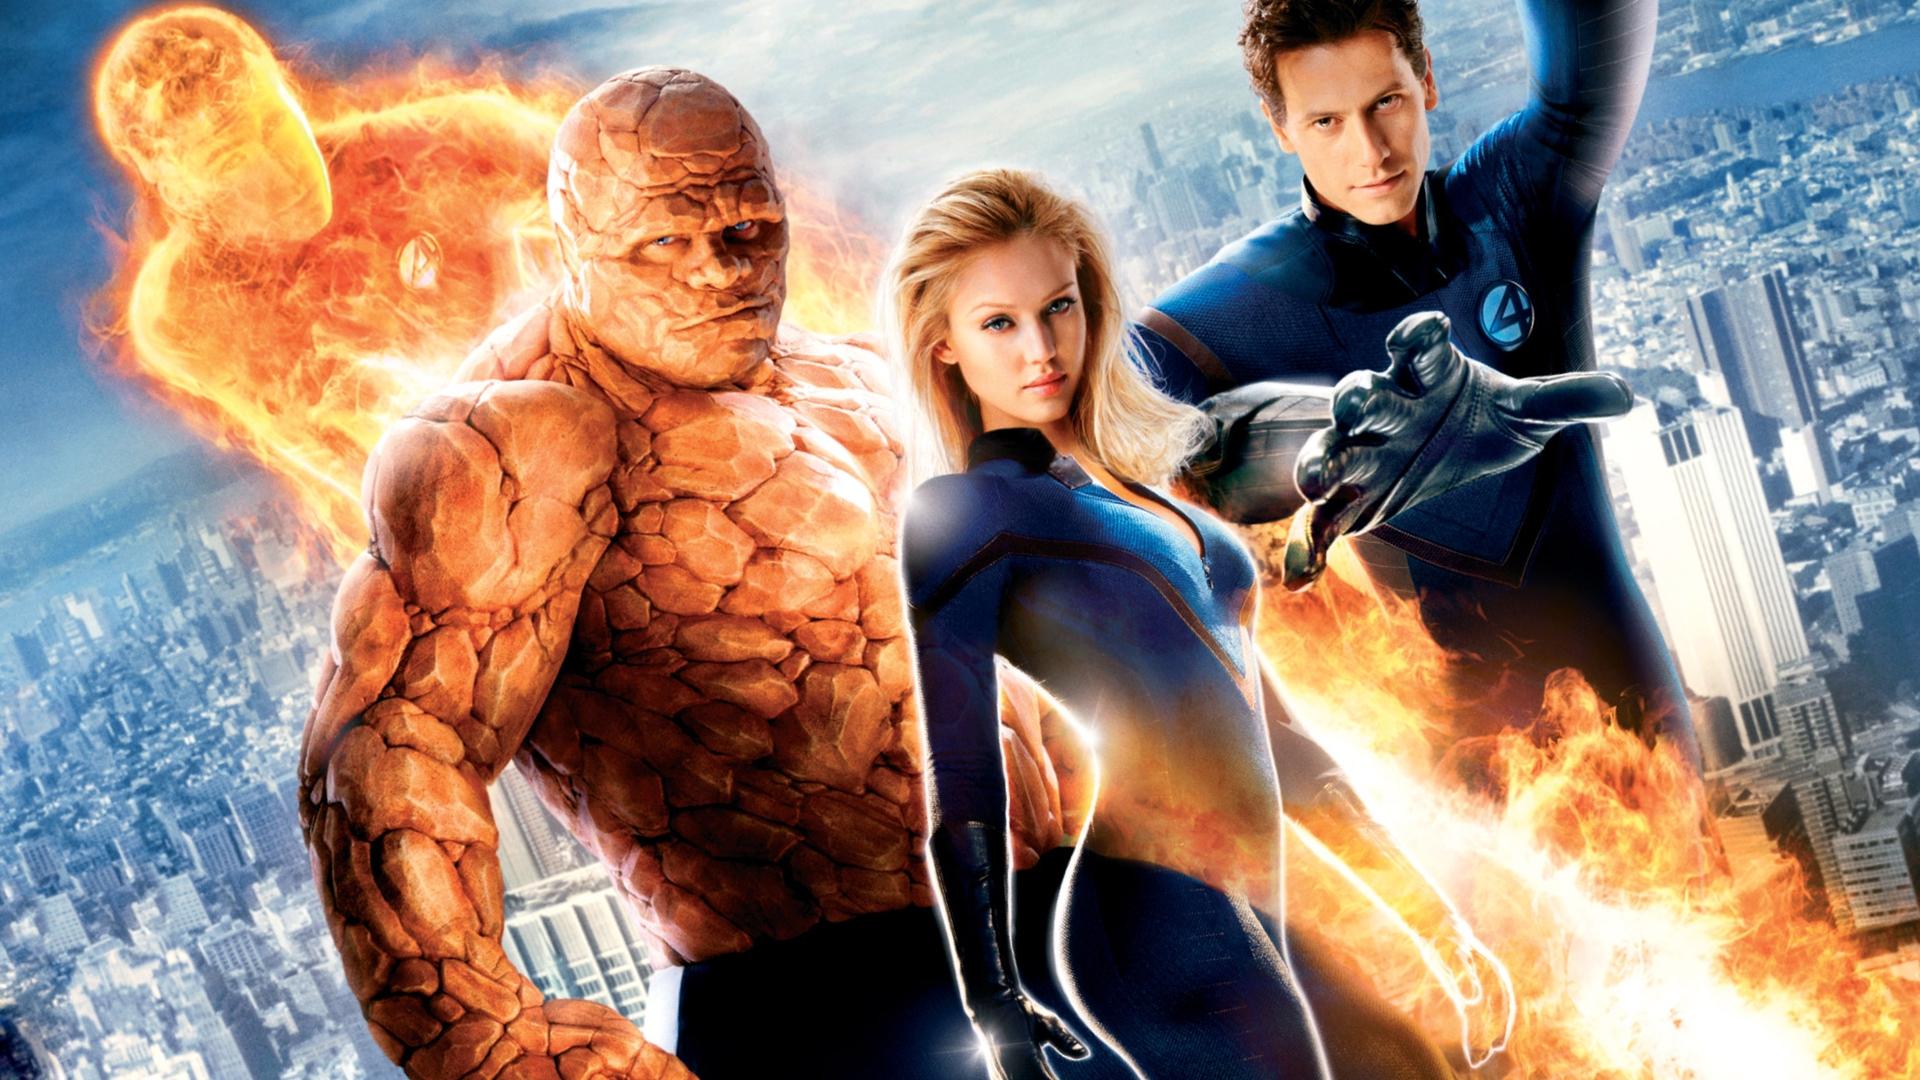 Download 1920x1080 Superheroes, Fantastic 4, Team, Marvel, Thing, Mr fantastic, Invisible woman, Human torch, Ioan gruffudd, Jessica alba, Chris evans, ...